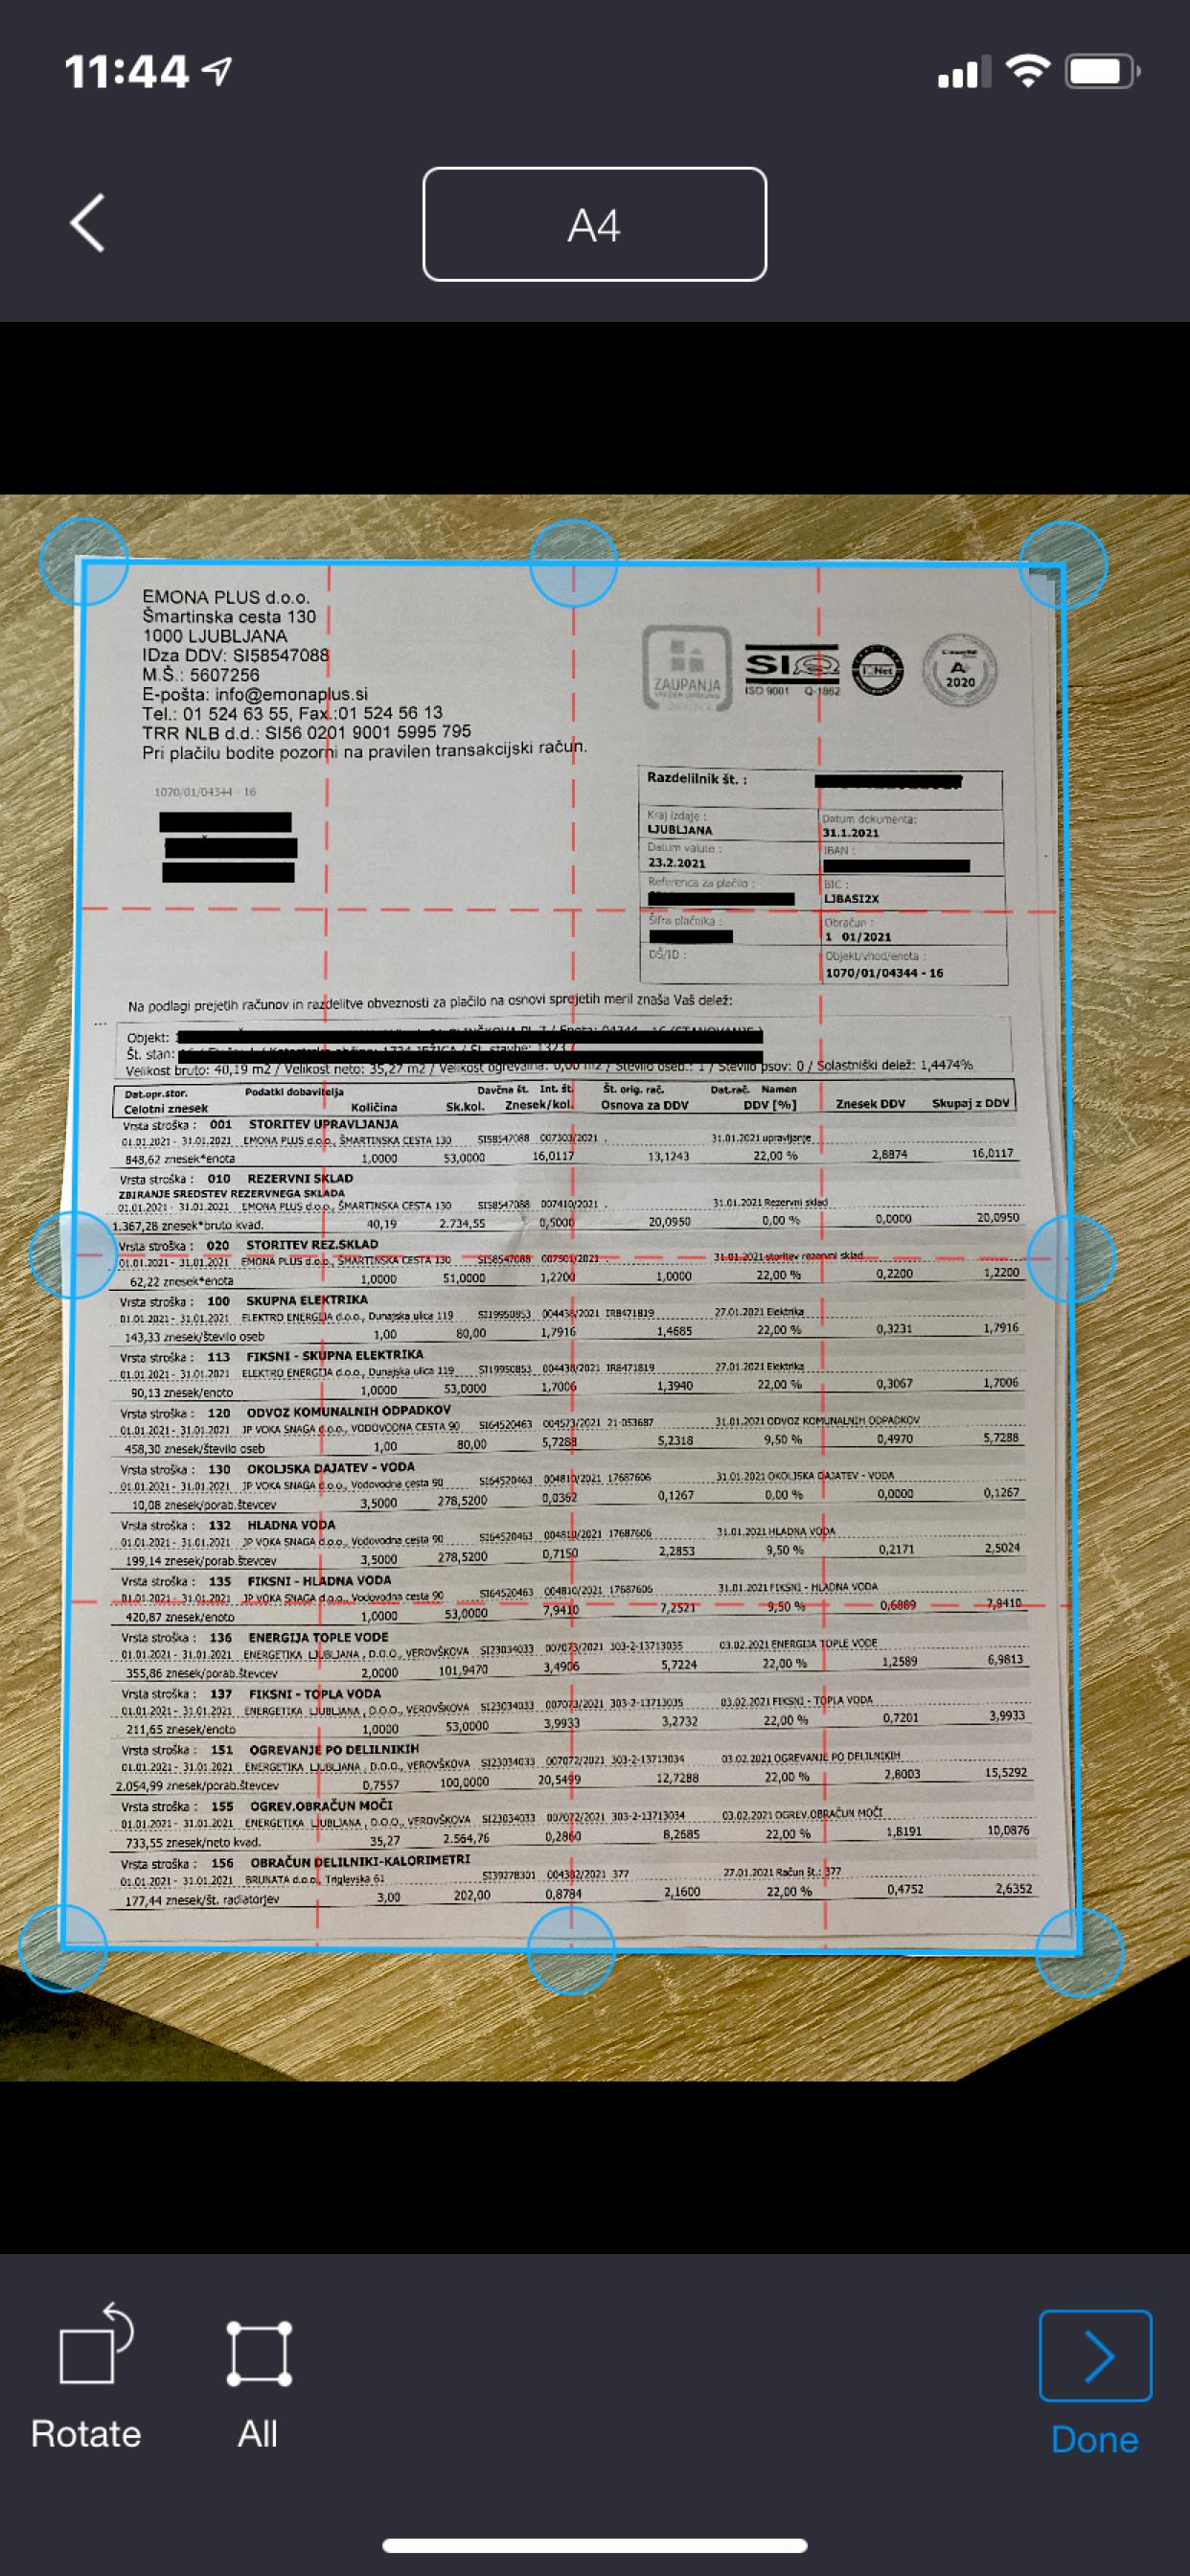 My Fax - send fax from smartphone screenshot